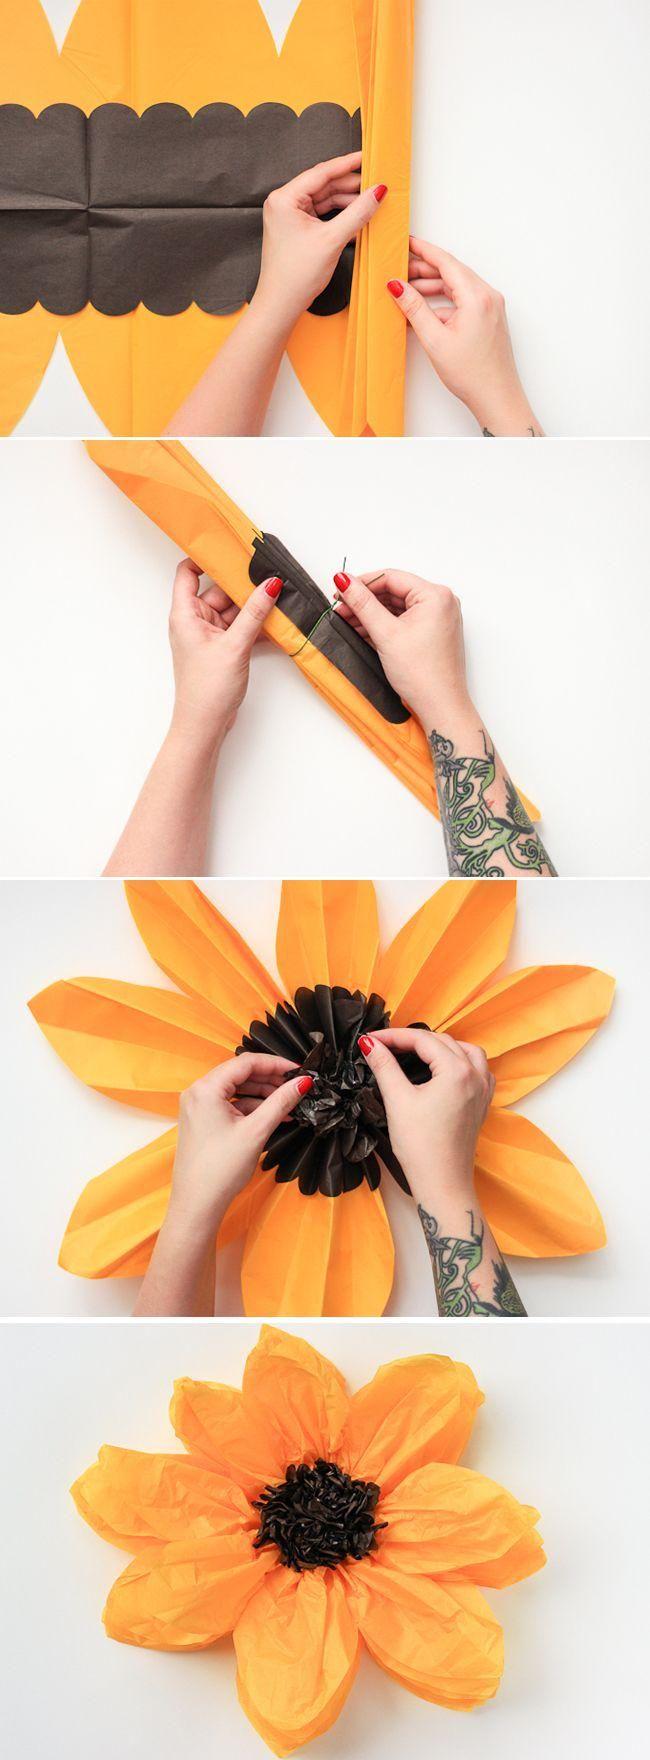 Diy tissue paper flower targetas pinterest tissue paper